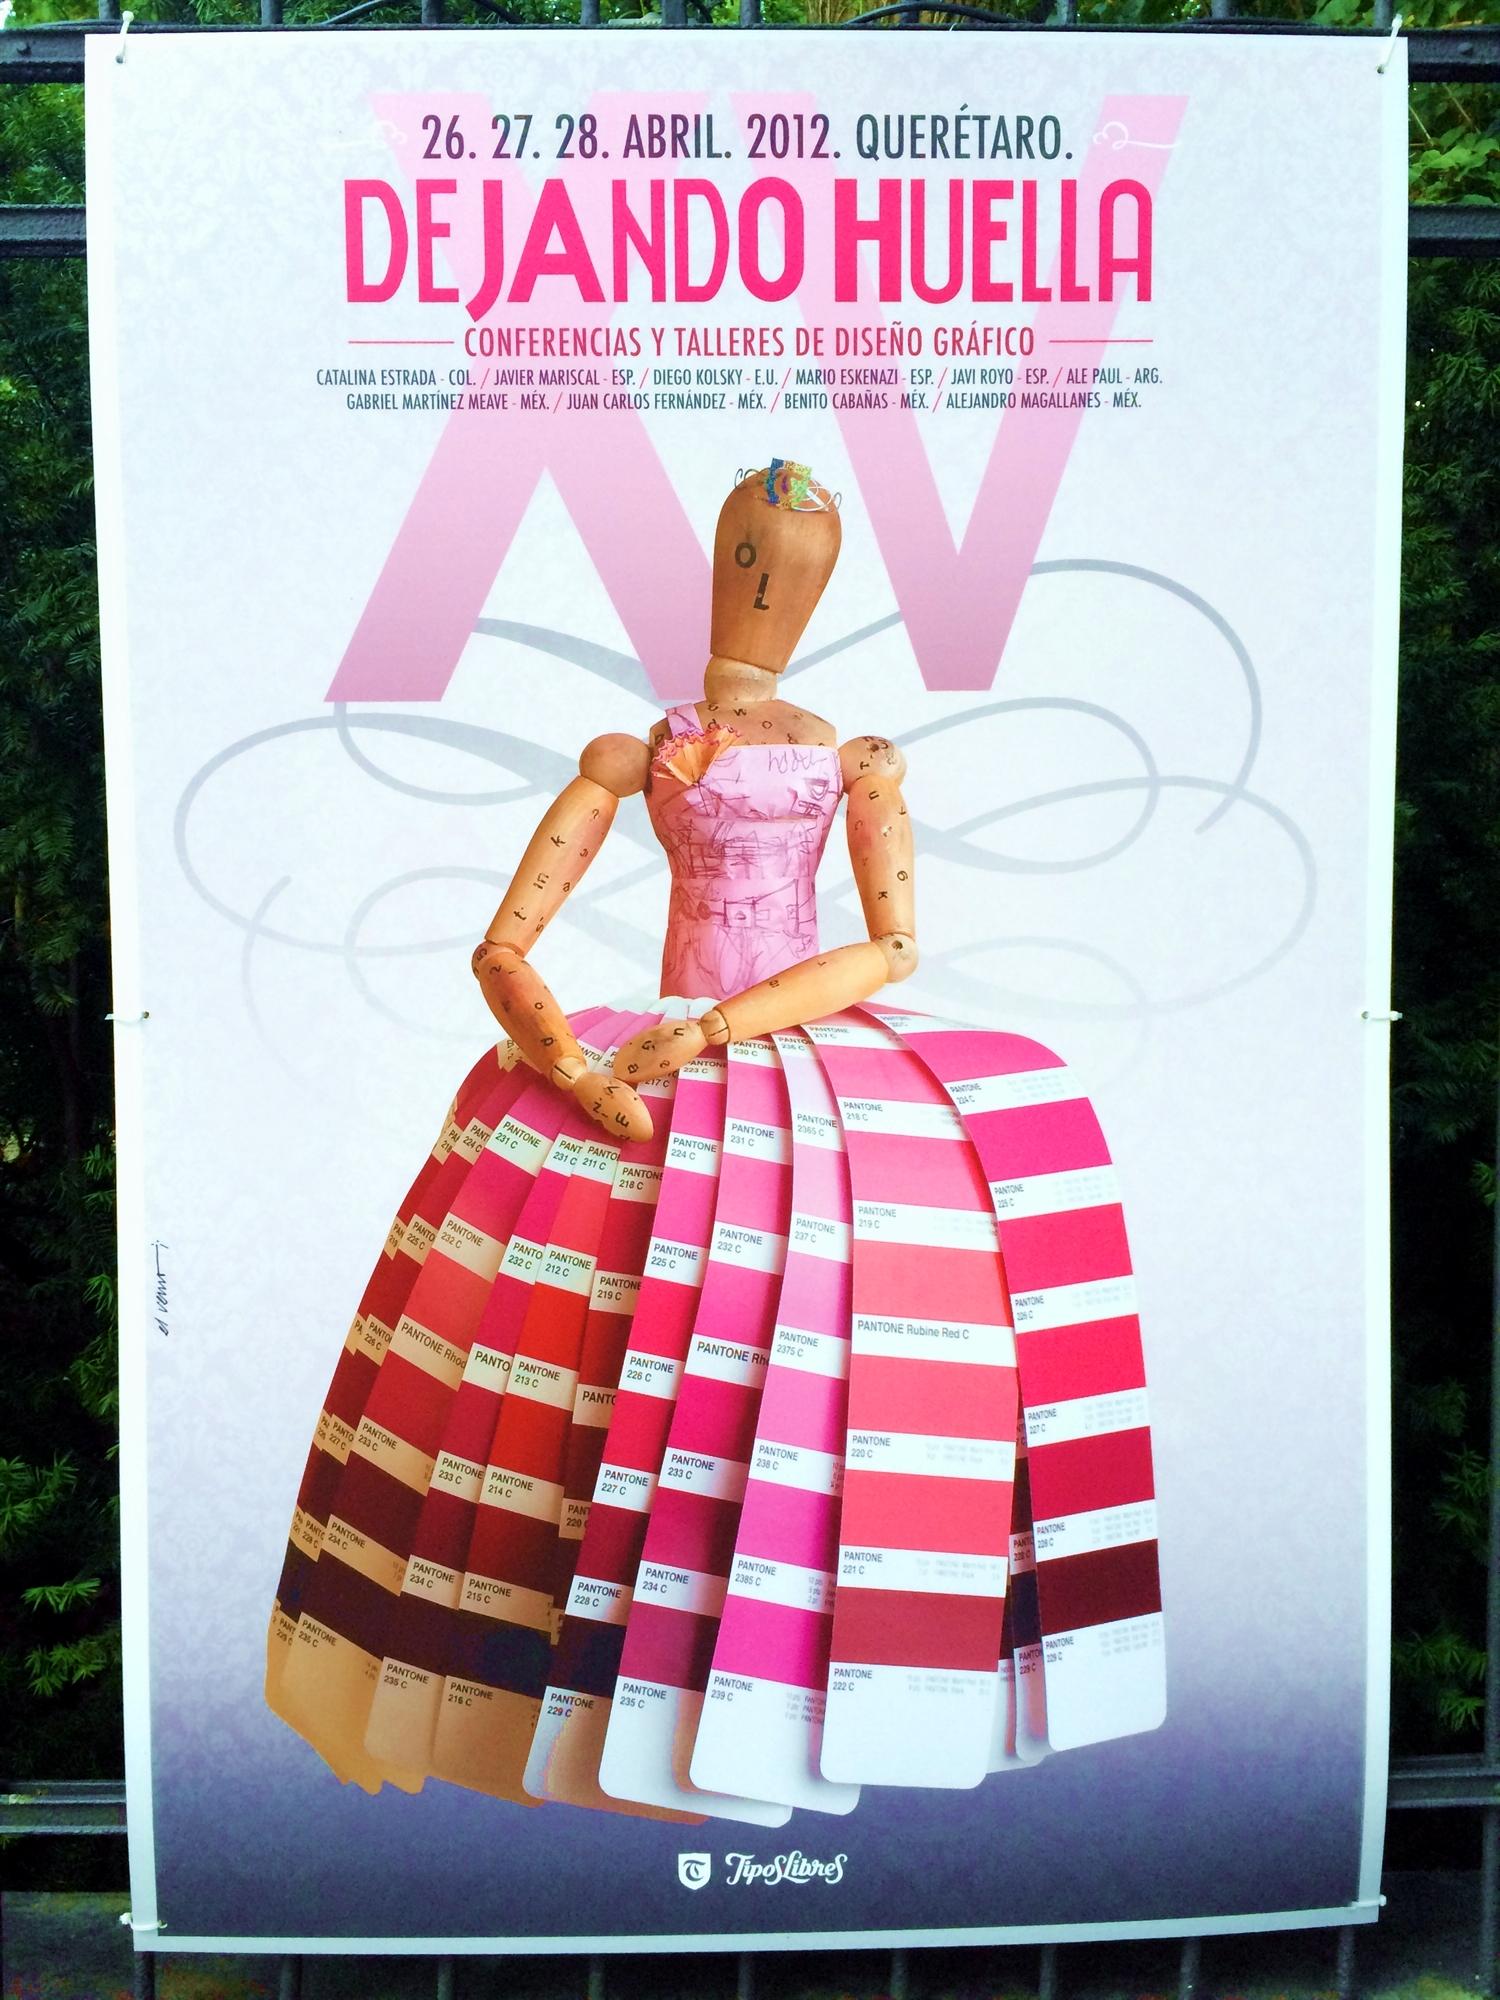 7 Mexican poster street art design plakat meksykanski projektowanie uzytkowe sztuka uliczna FORelementspl